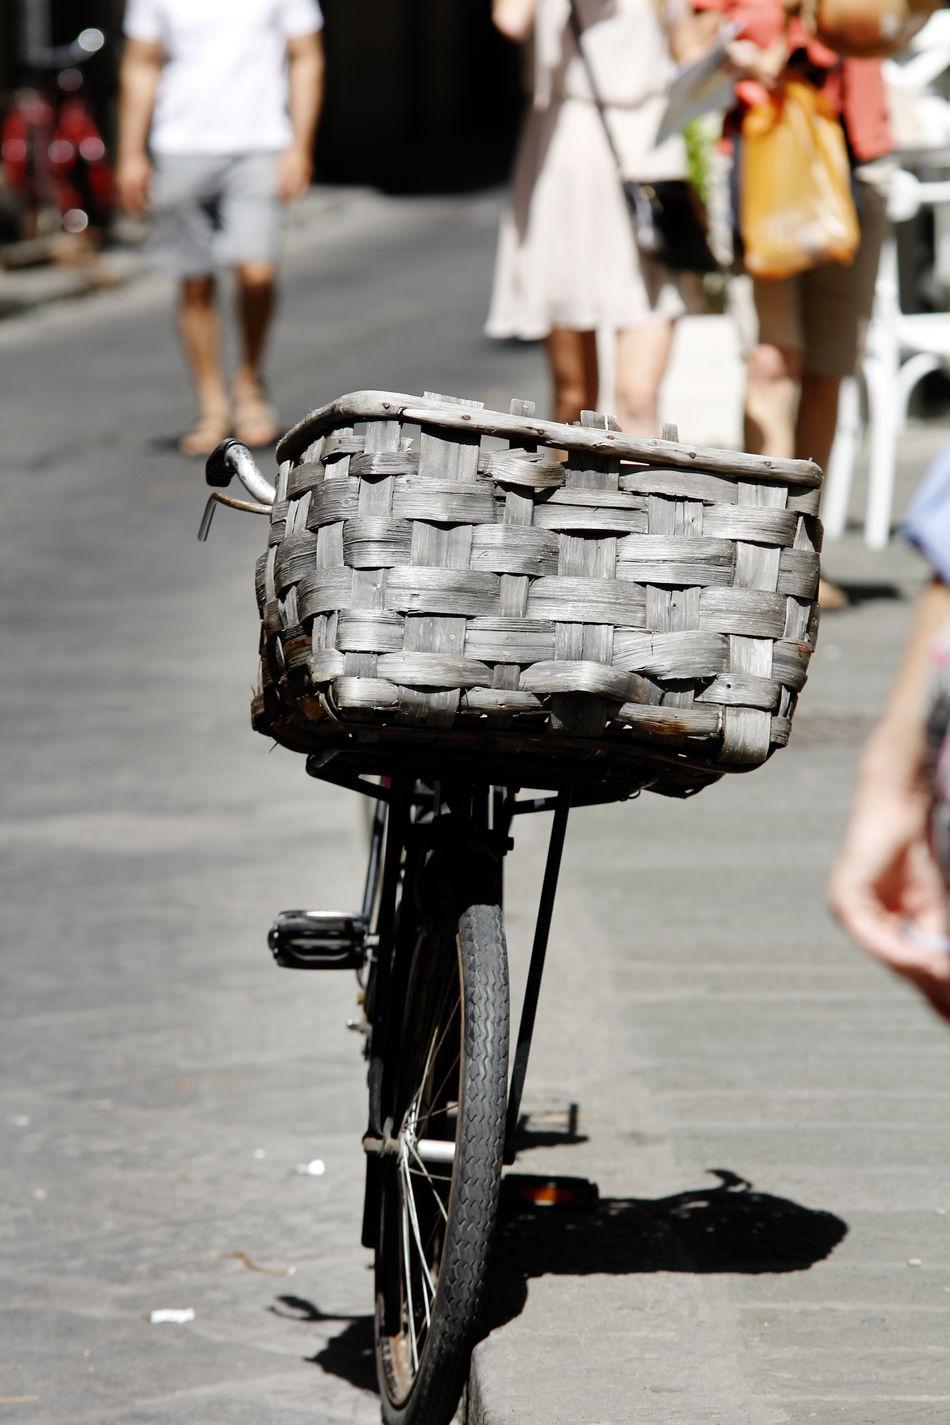 Basket Basket Bike Bike Bike With Basket Bikes Italy Italy Basket Italy Bike